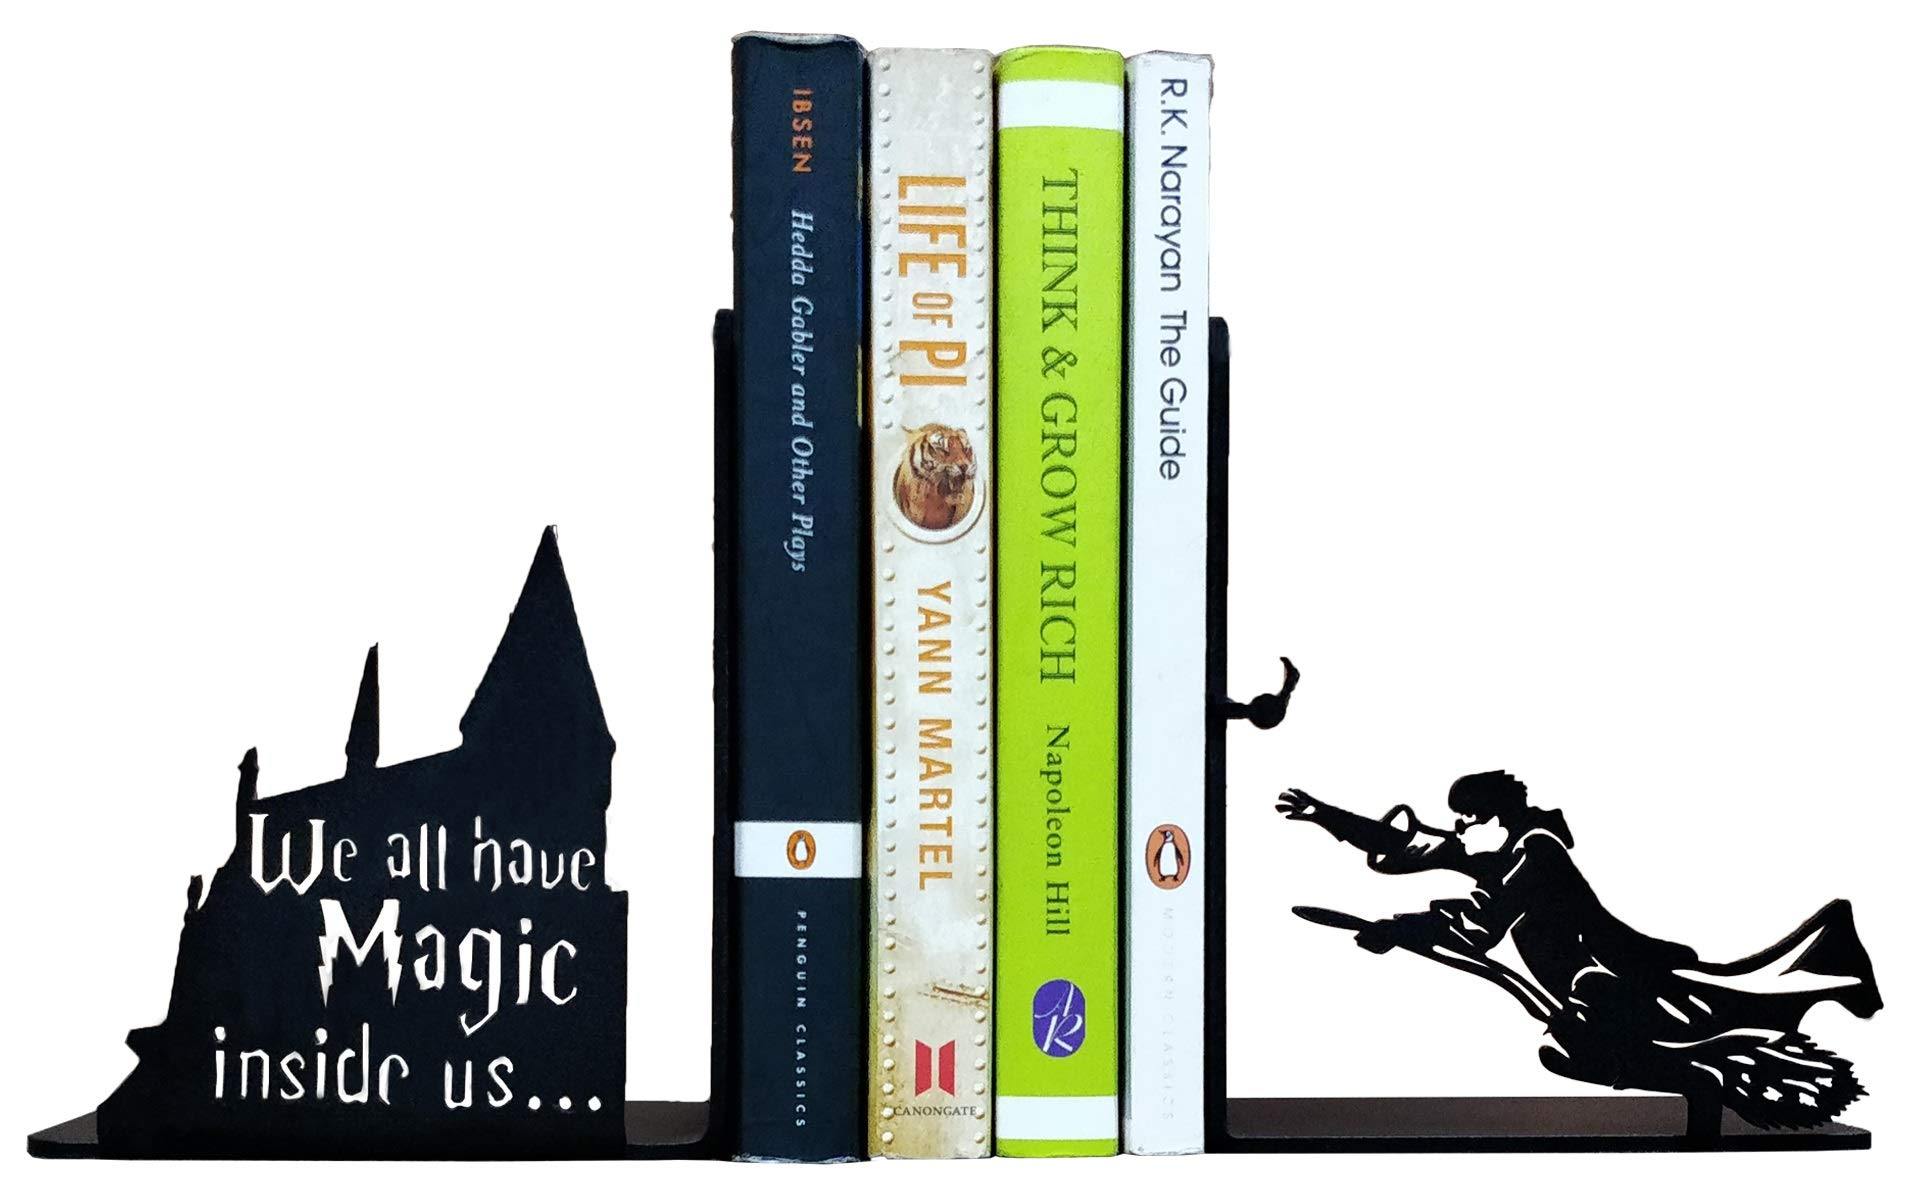 HeavenlyKraft Decorative Metal Bookend, Office Décor/Non Skid Book End, Book Stopper for Home/Office Decor/Shelves, Children Room Décor, 5.9 X 3.9 X 3.14 Inch Per Piece (Weight 2.5 Pound/Pair)